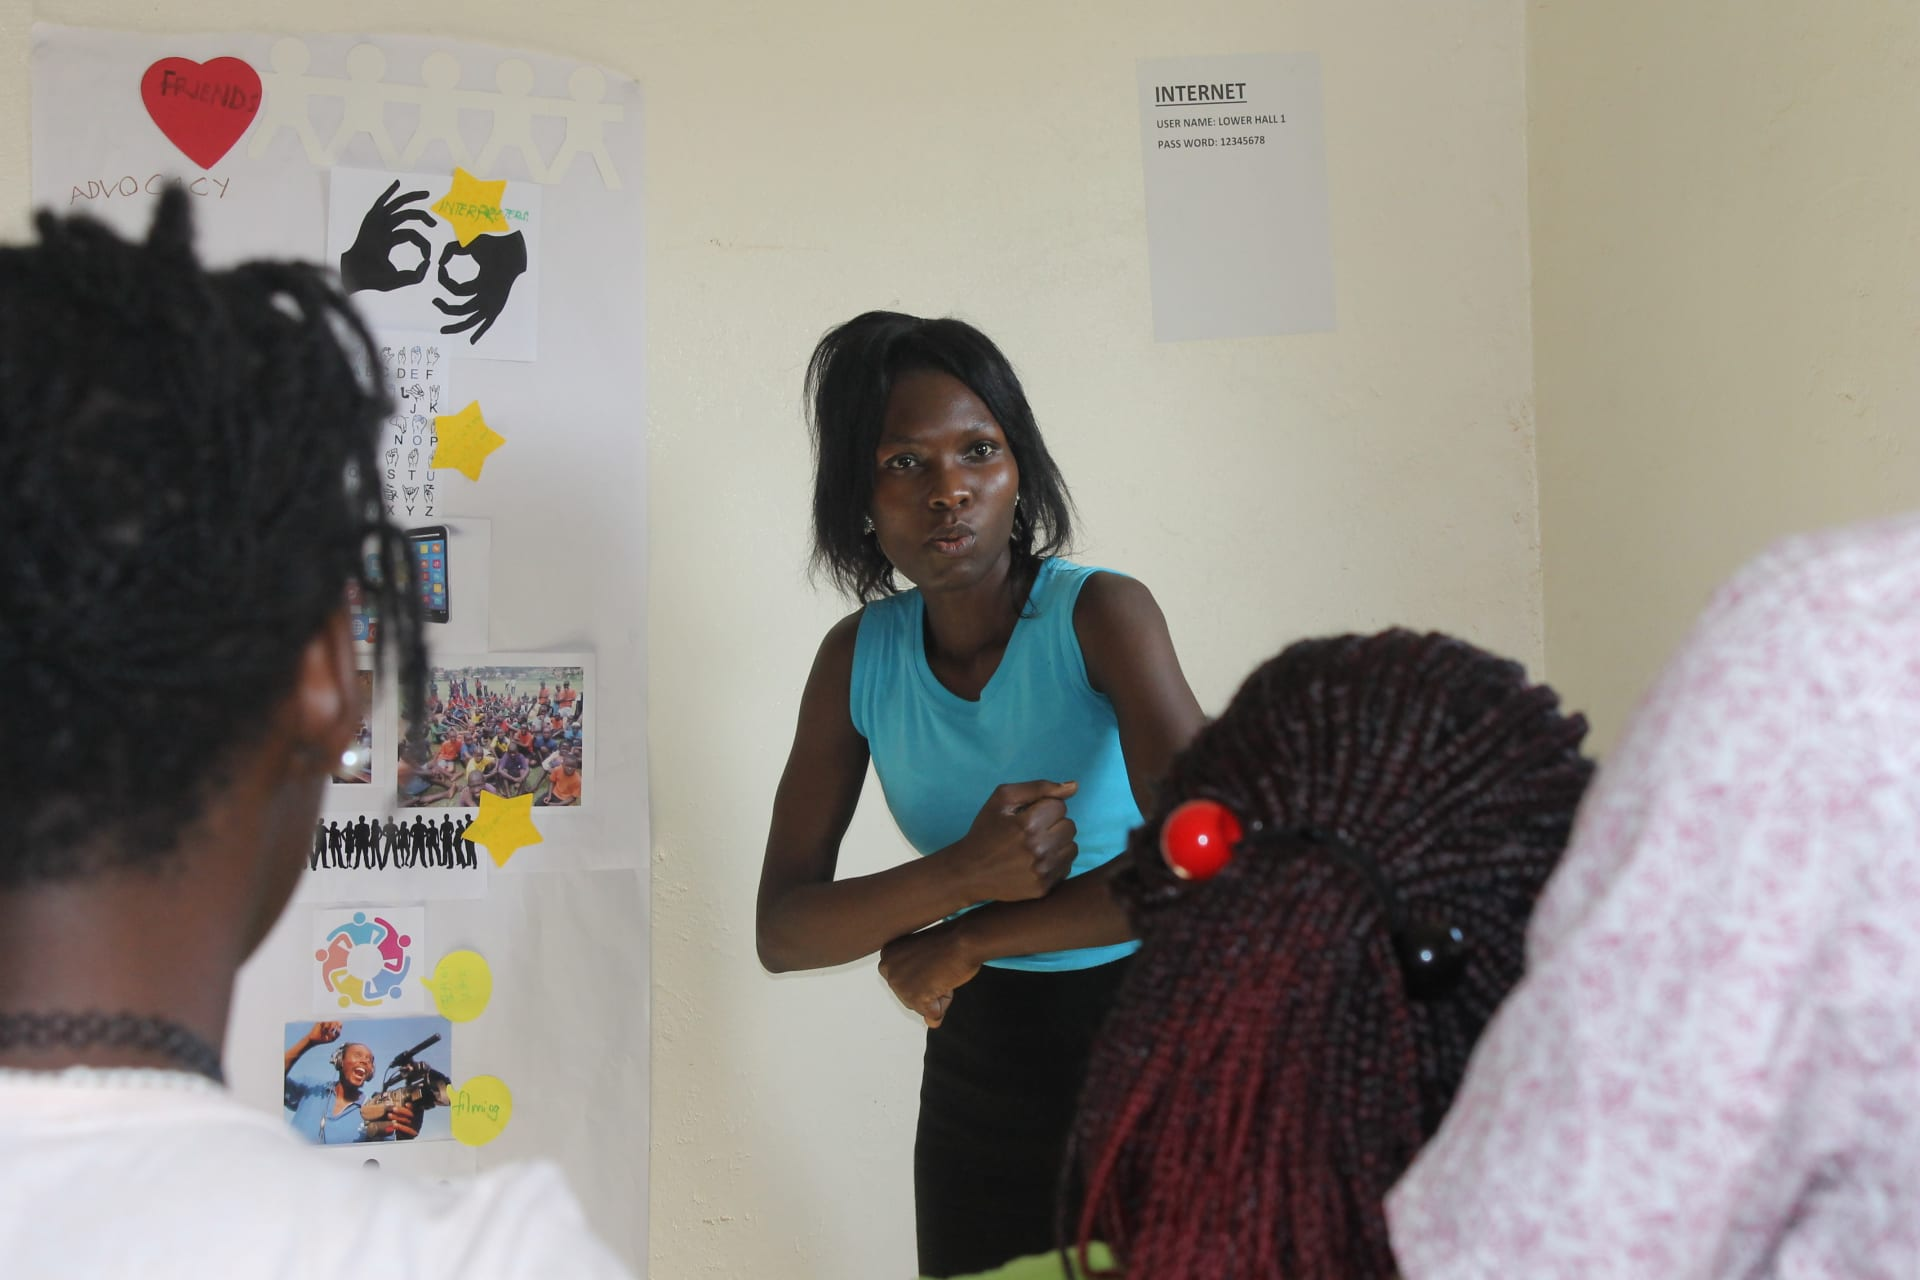 Kampala - The Deaf Community in Kampala